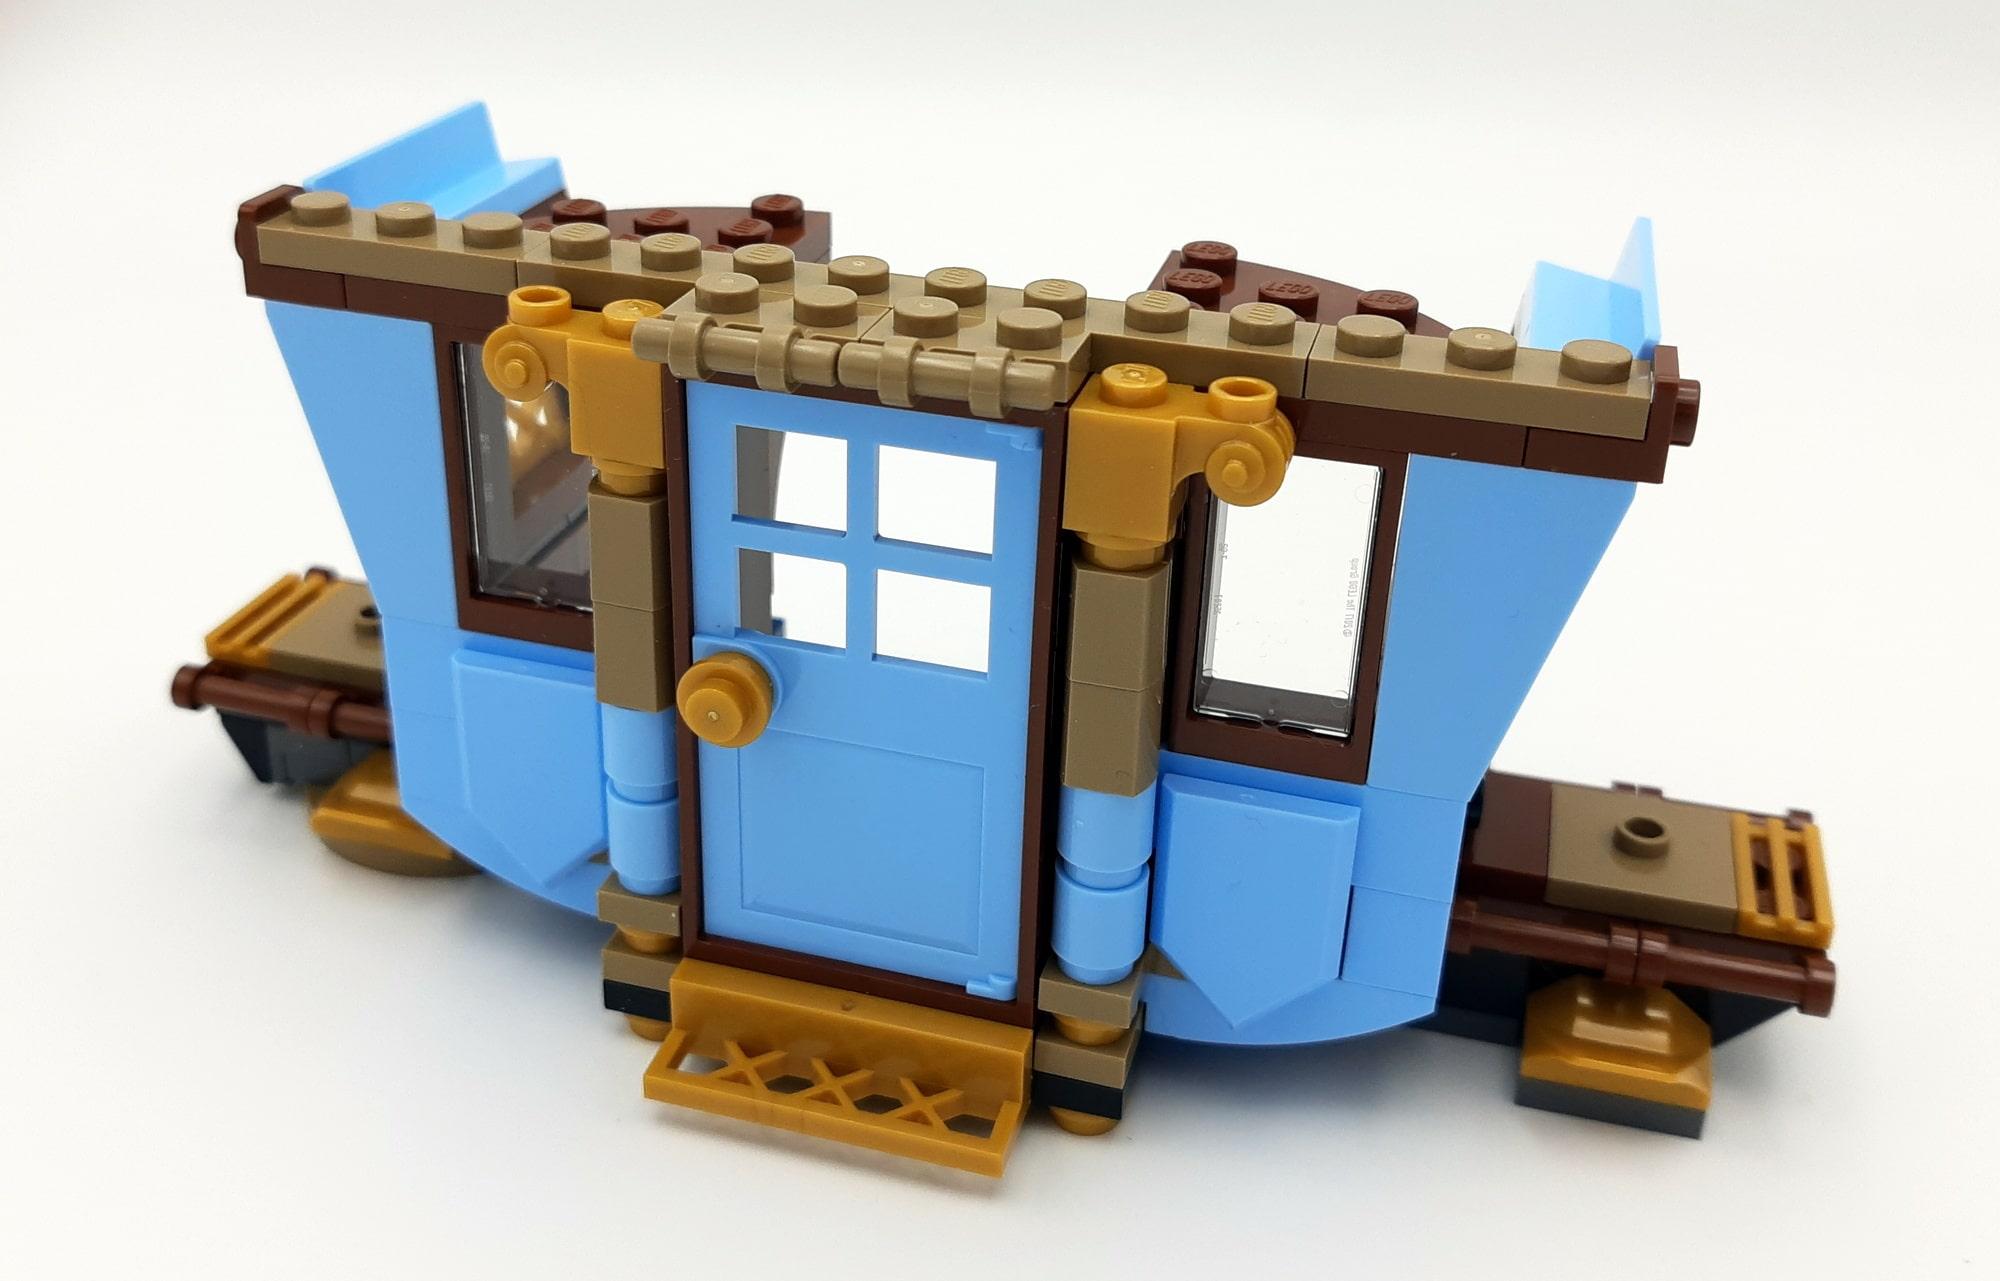 LEGO 75958 Harry Potter Beauxbatons Kutsche Bauabschnitt 1 Innen